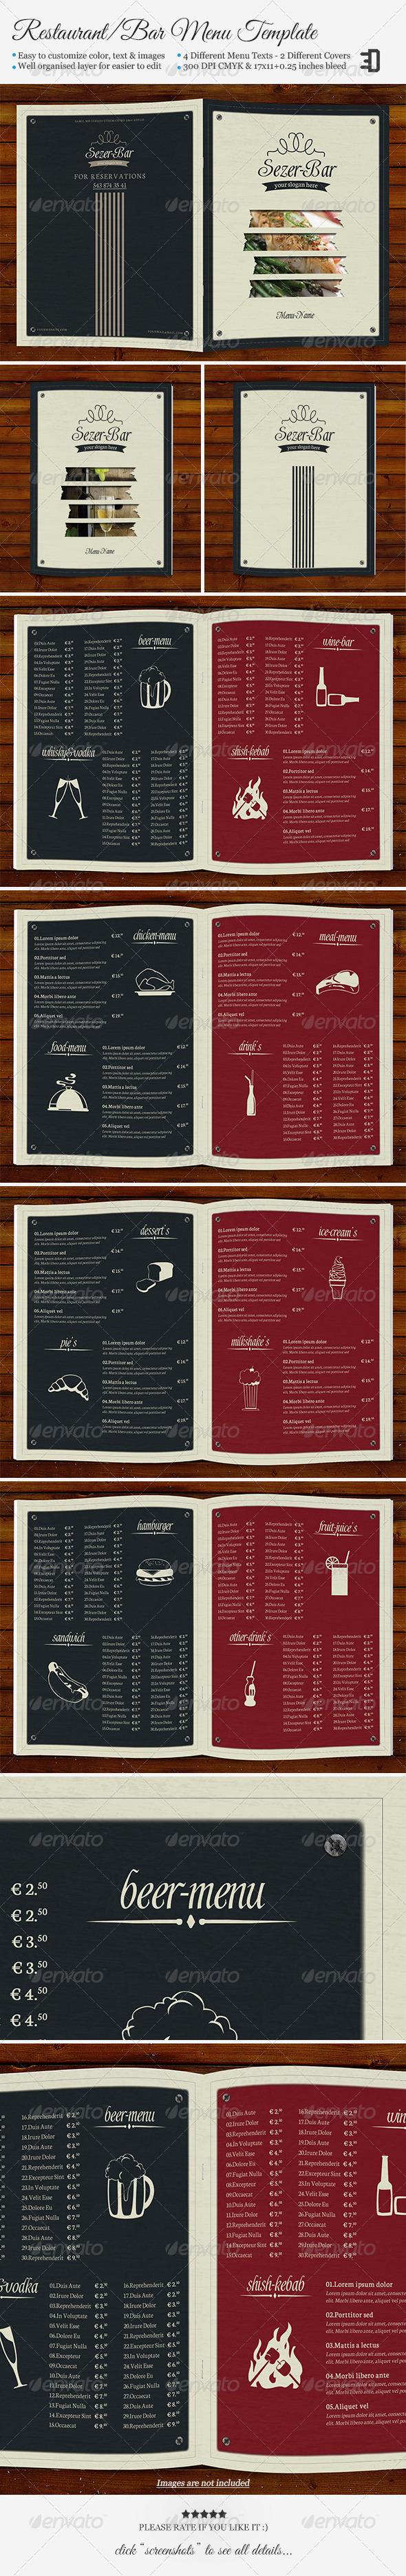 Restaurant/Bar Menu Template - Food Menus Print Templates